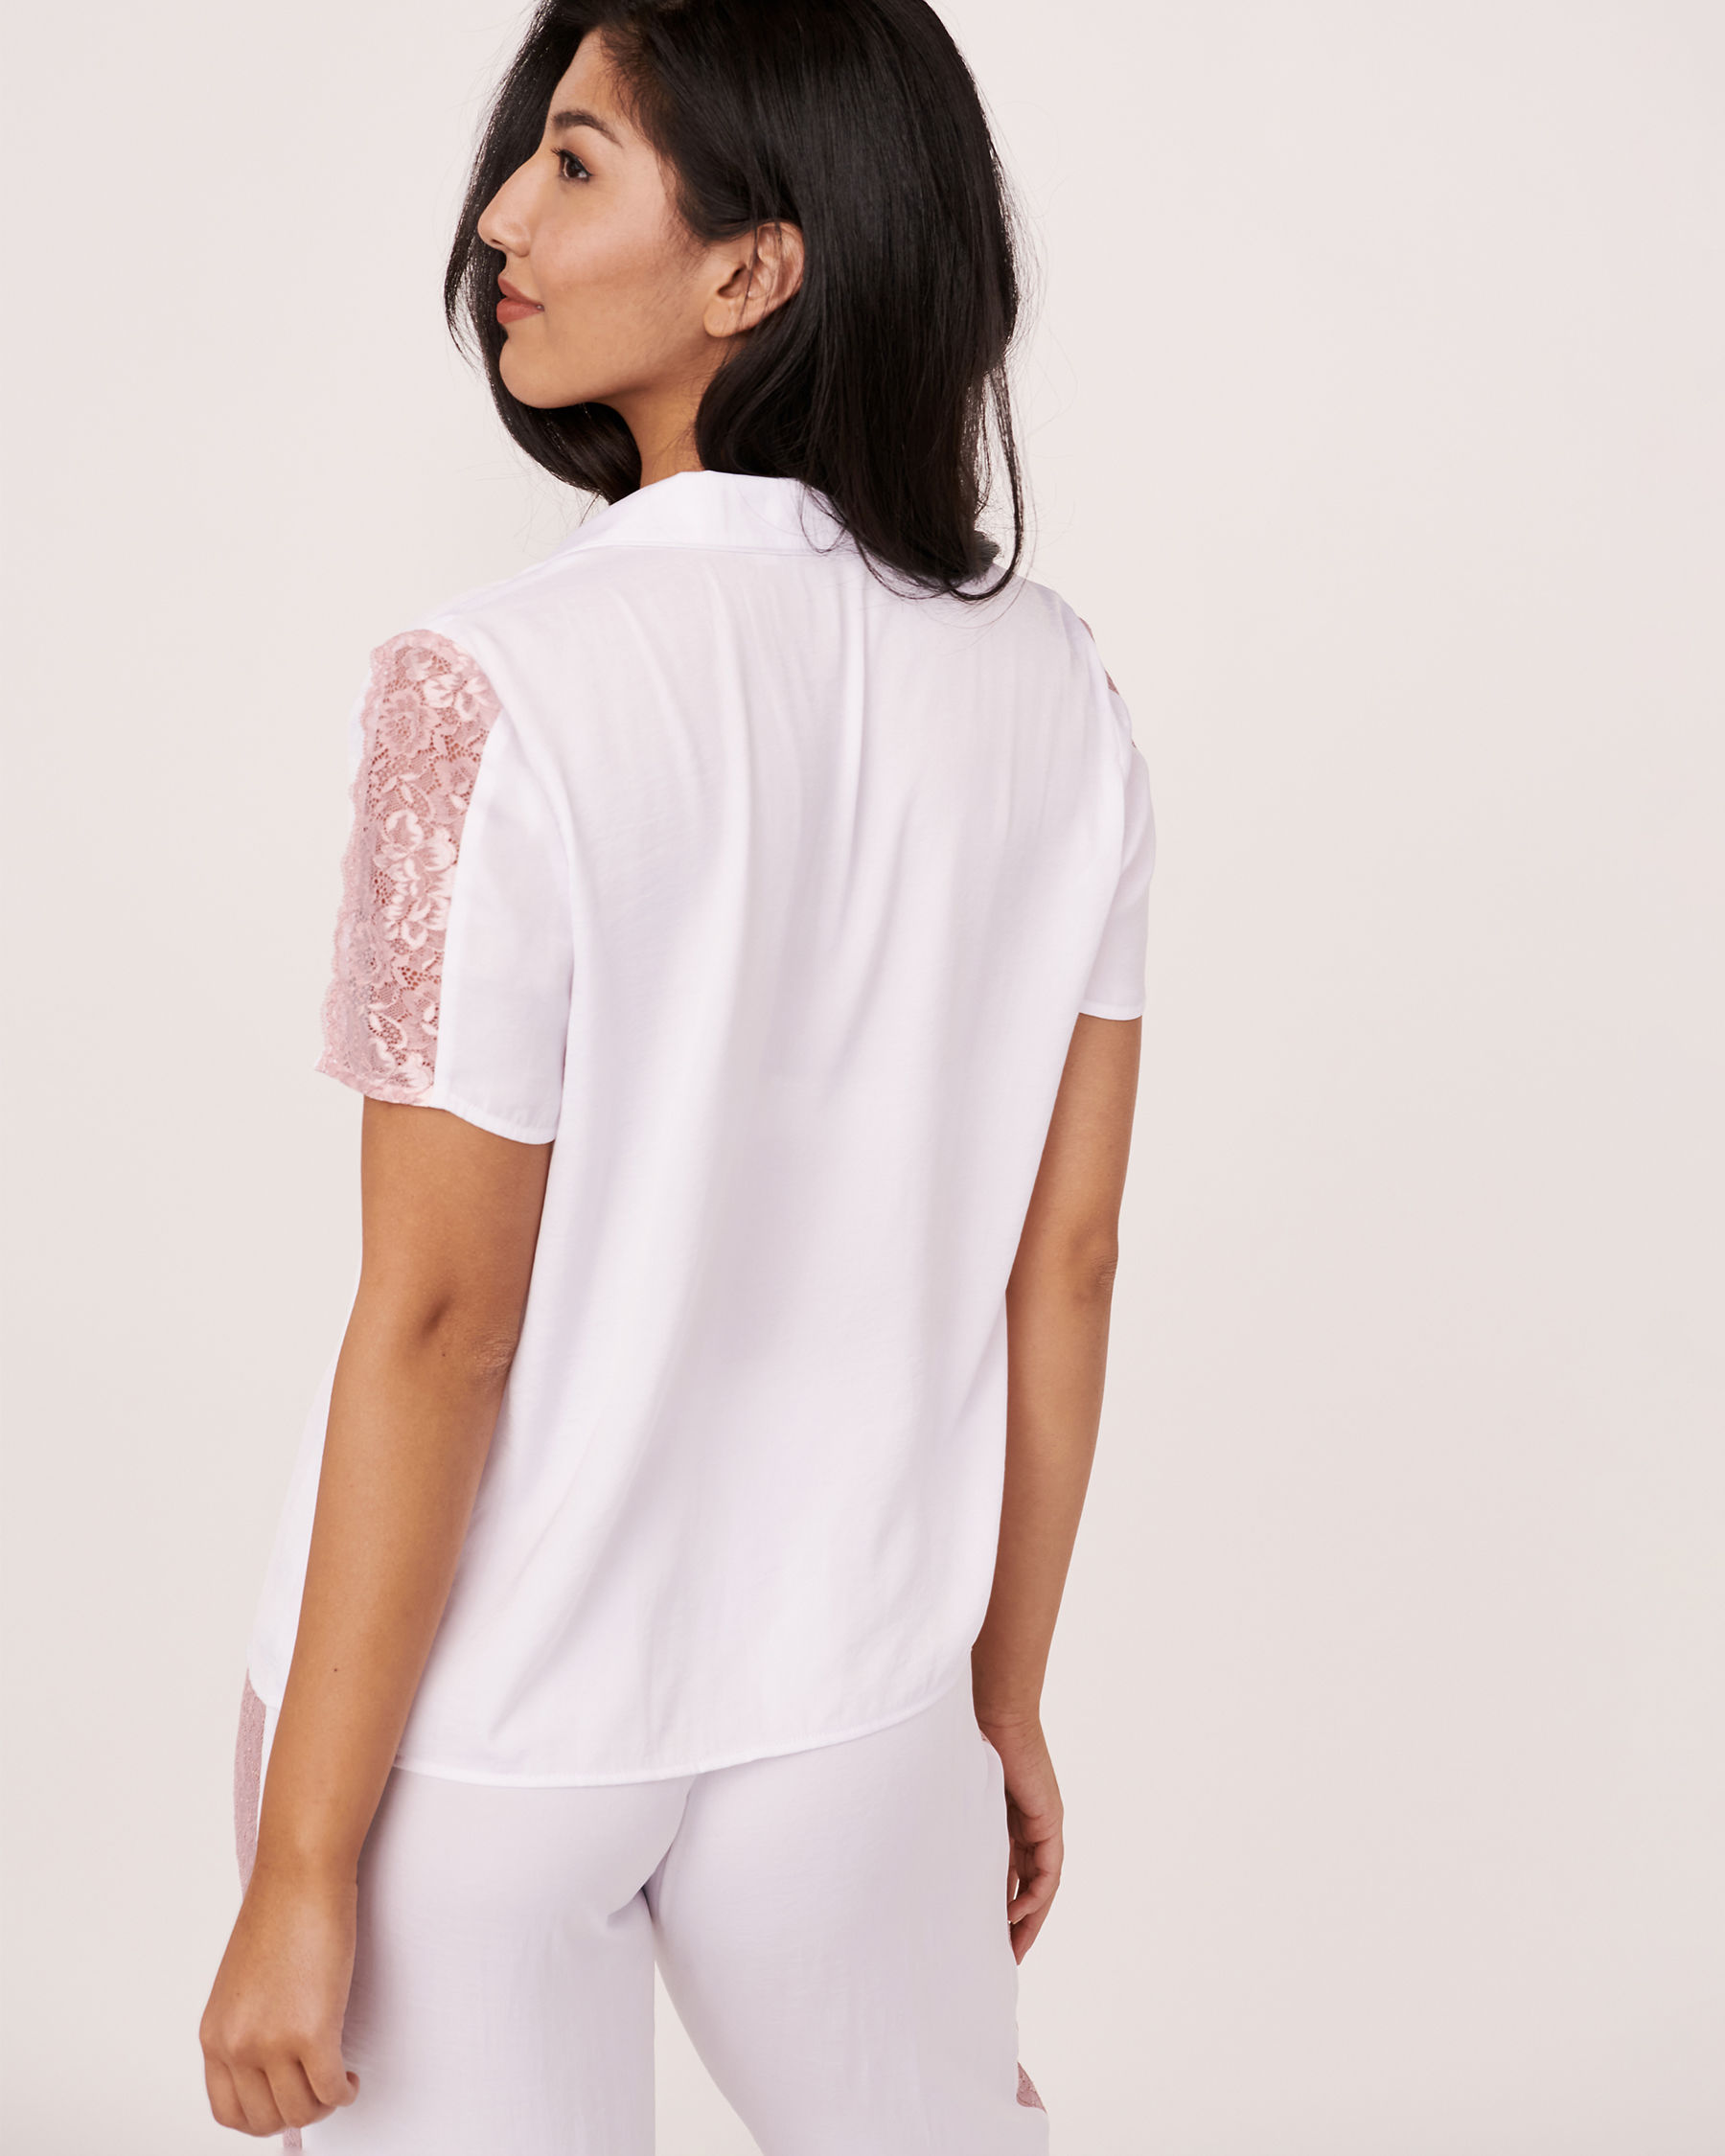 LA VIE EN ROSE Satin Short Sleeves Shirt White 620-415-0-04 - View2